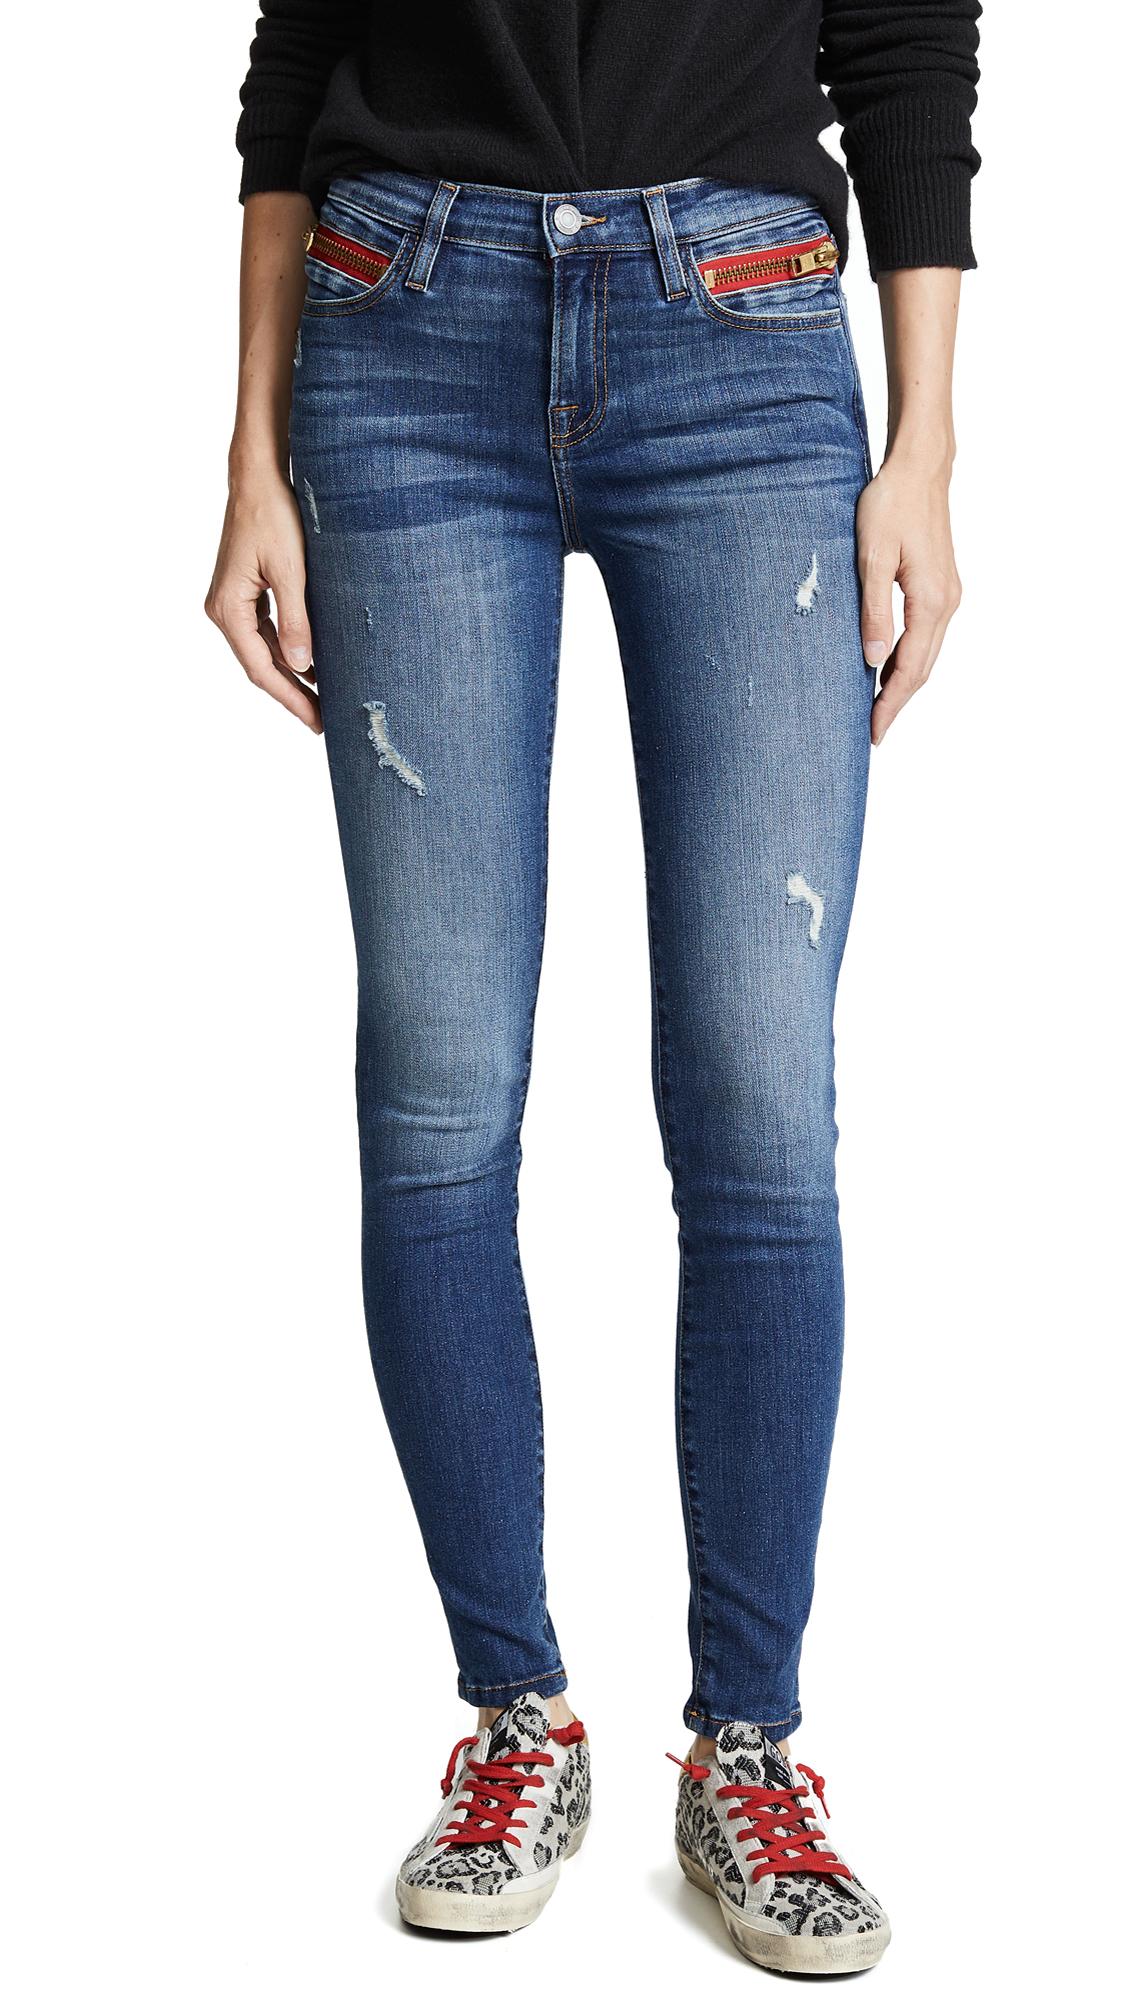 Etienne Marcel Highrise Cropped Skinny Jeans In Indigo